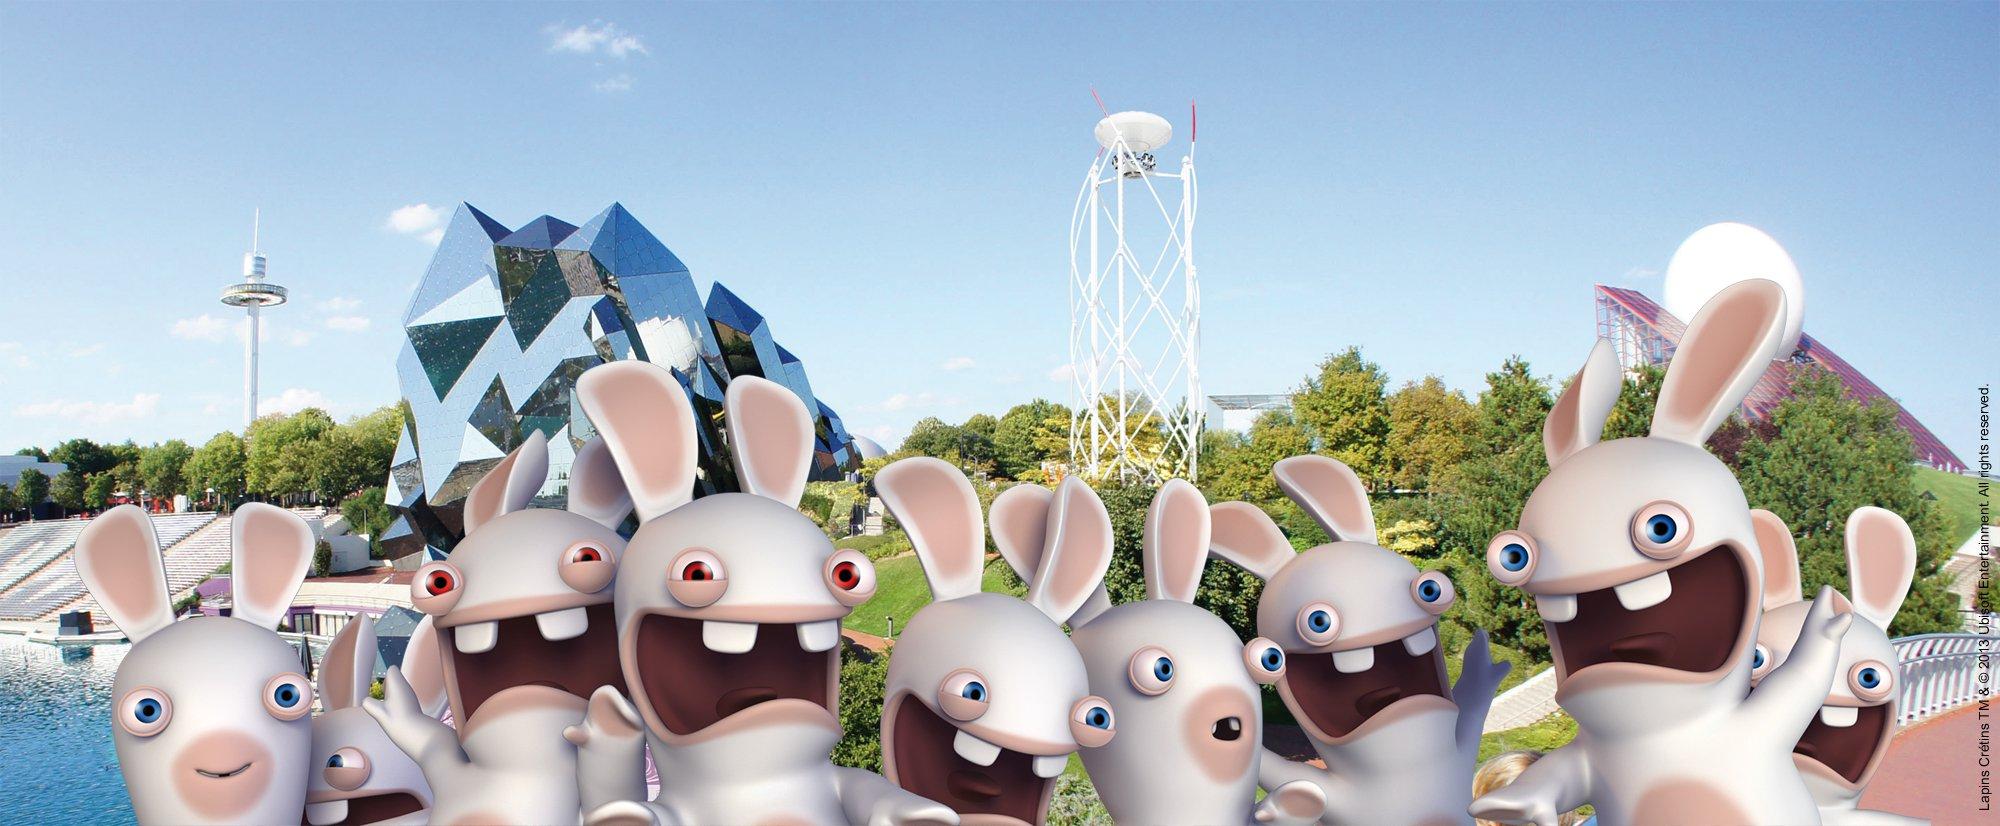 Les lapins cr tins d barquent futuroscope bon plan inside - Lapin cretin image ...